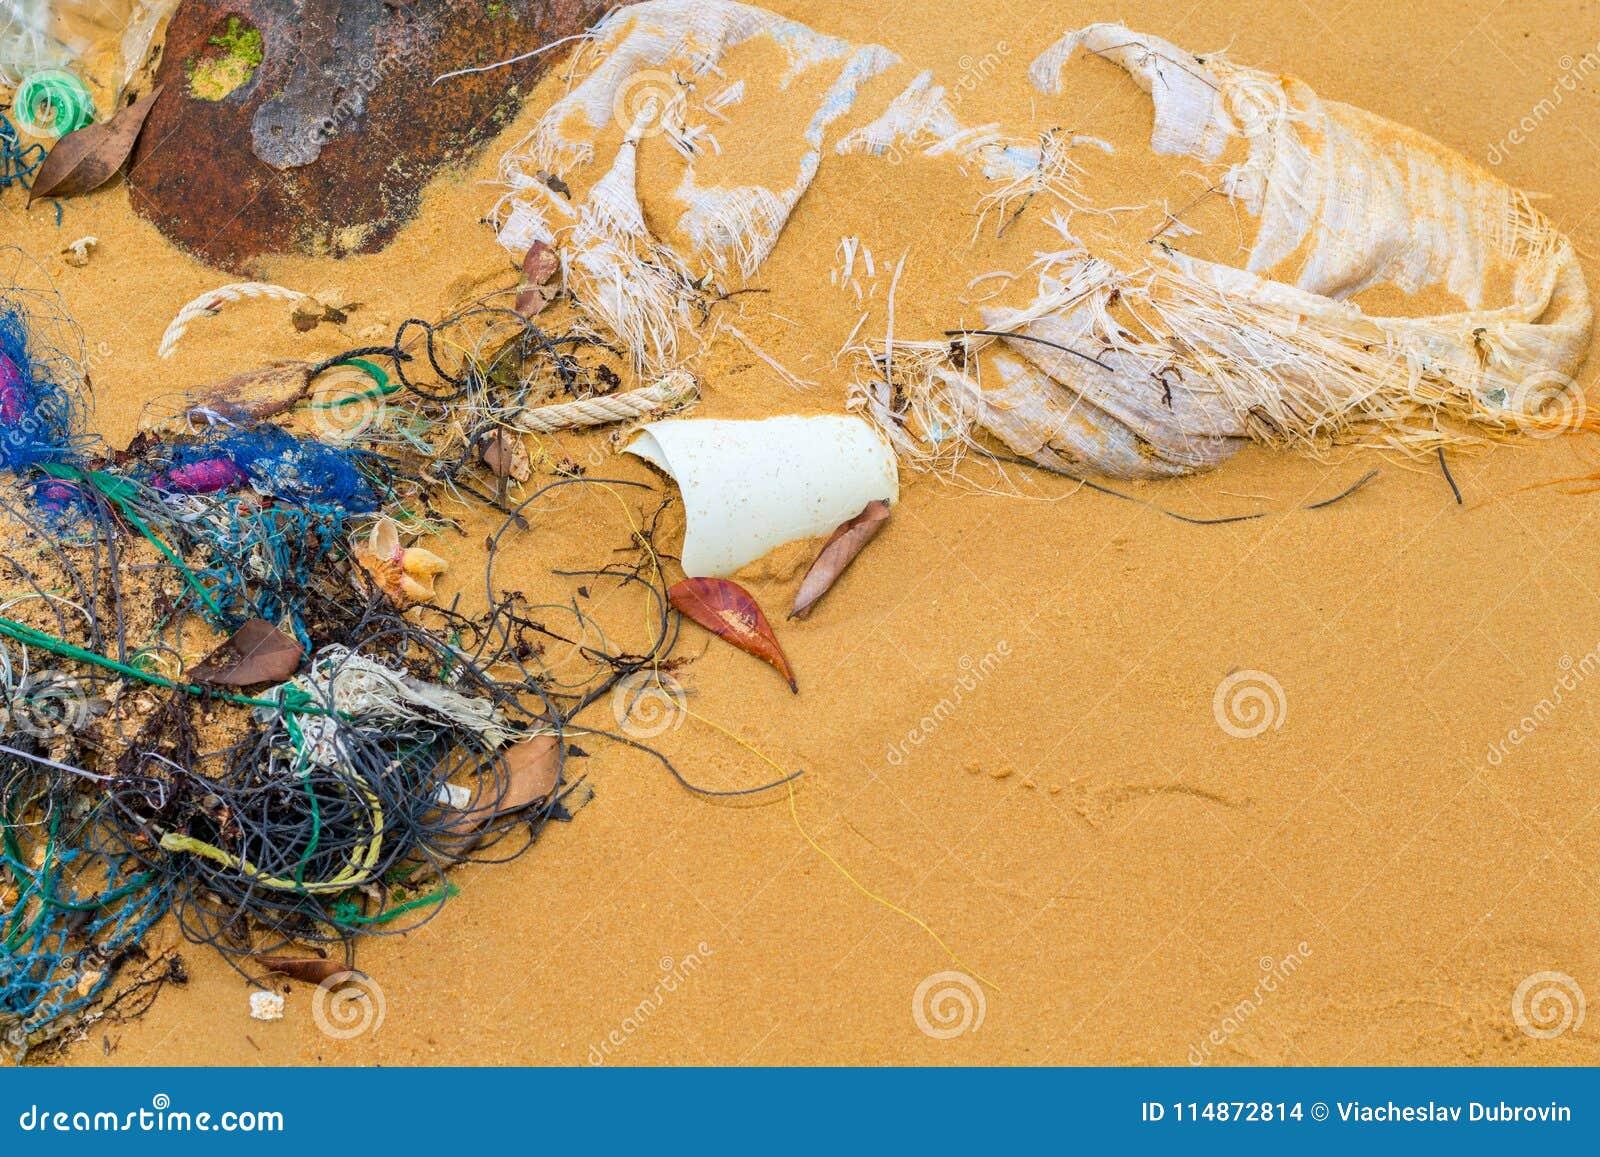 Lixo na praia da areia Lixo no litoral Problema ecológico Plástico no mar